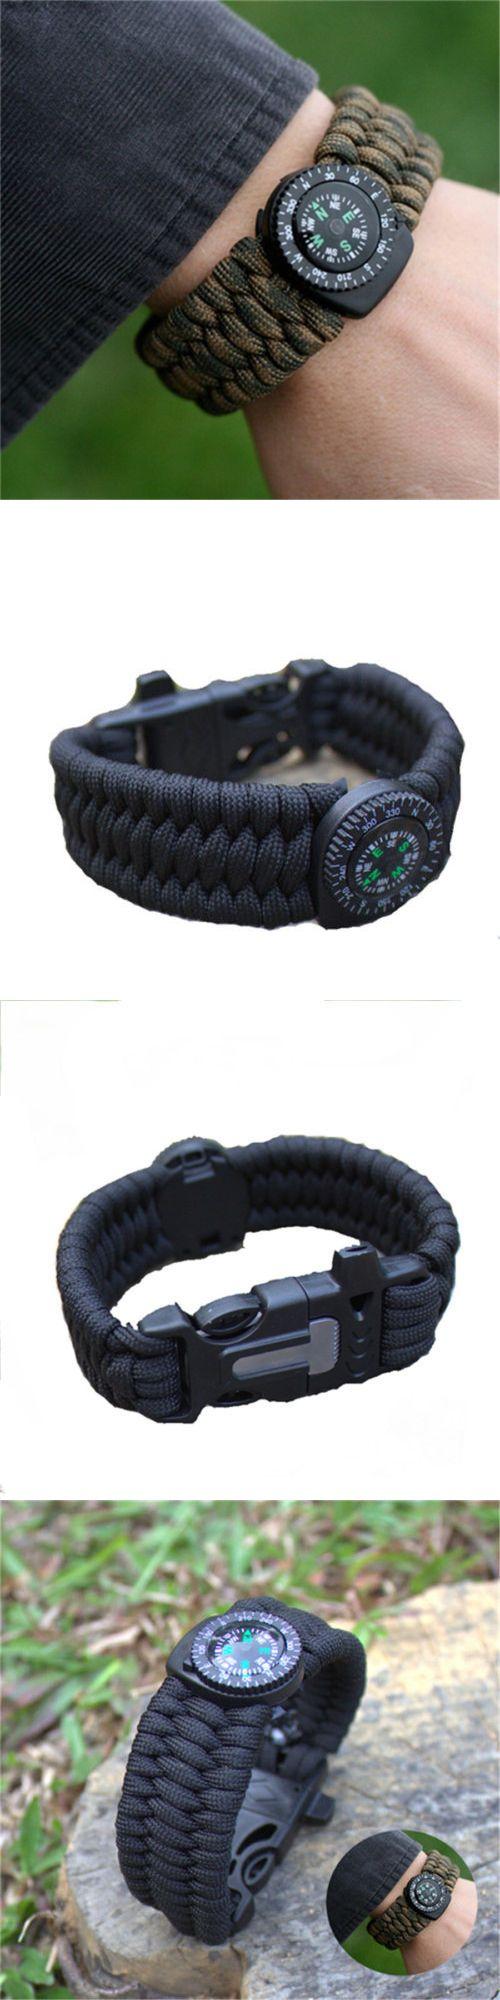 Paracord Bracelets 181413: 50Pcs Paracord Survival Bracelet Compass Flint Fire Starter Whistle Scraper Kit -> BUY IT NOW ONLY: $99.99 on eBay!